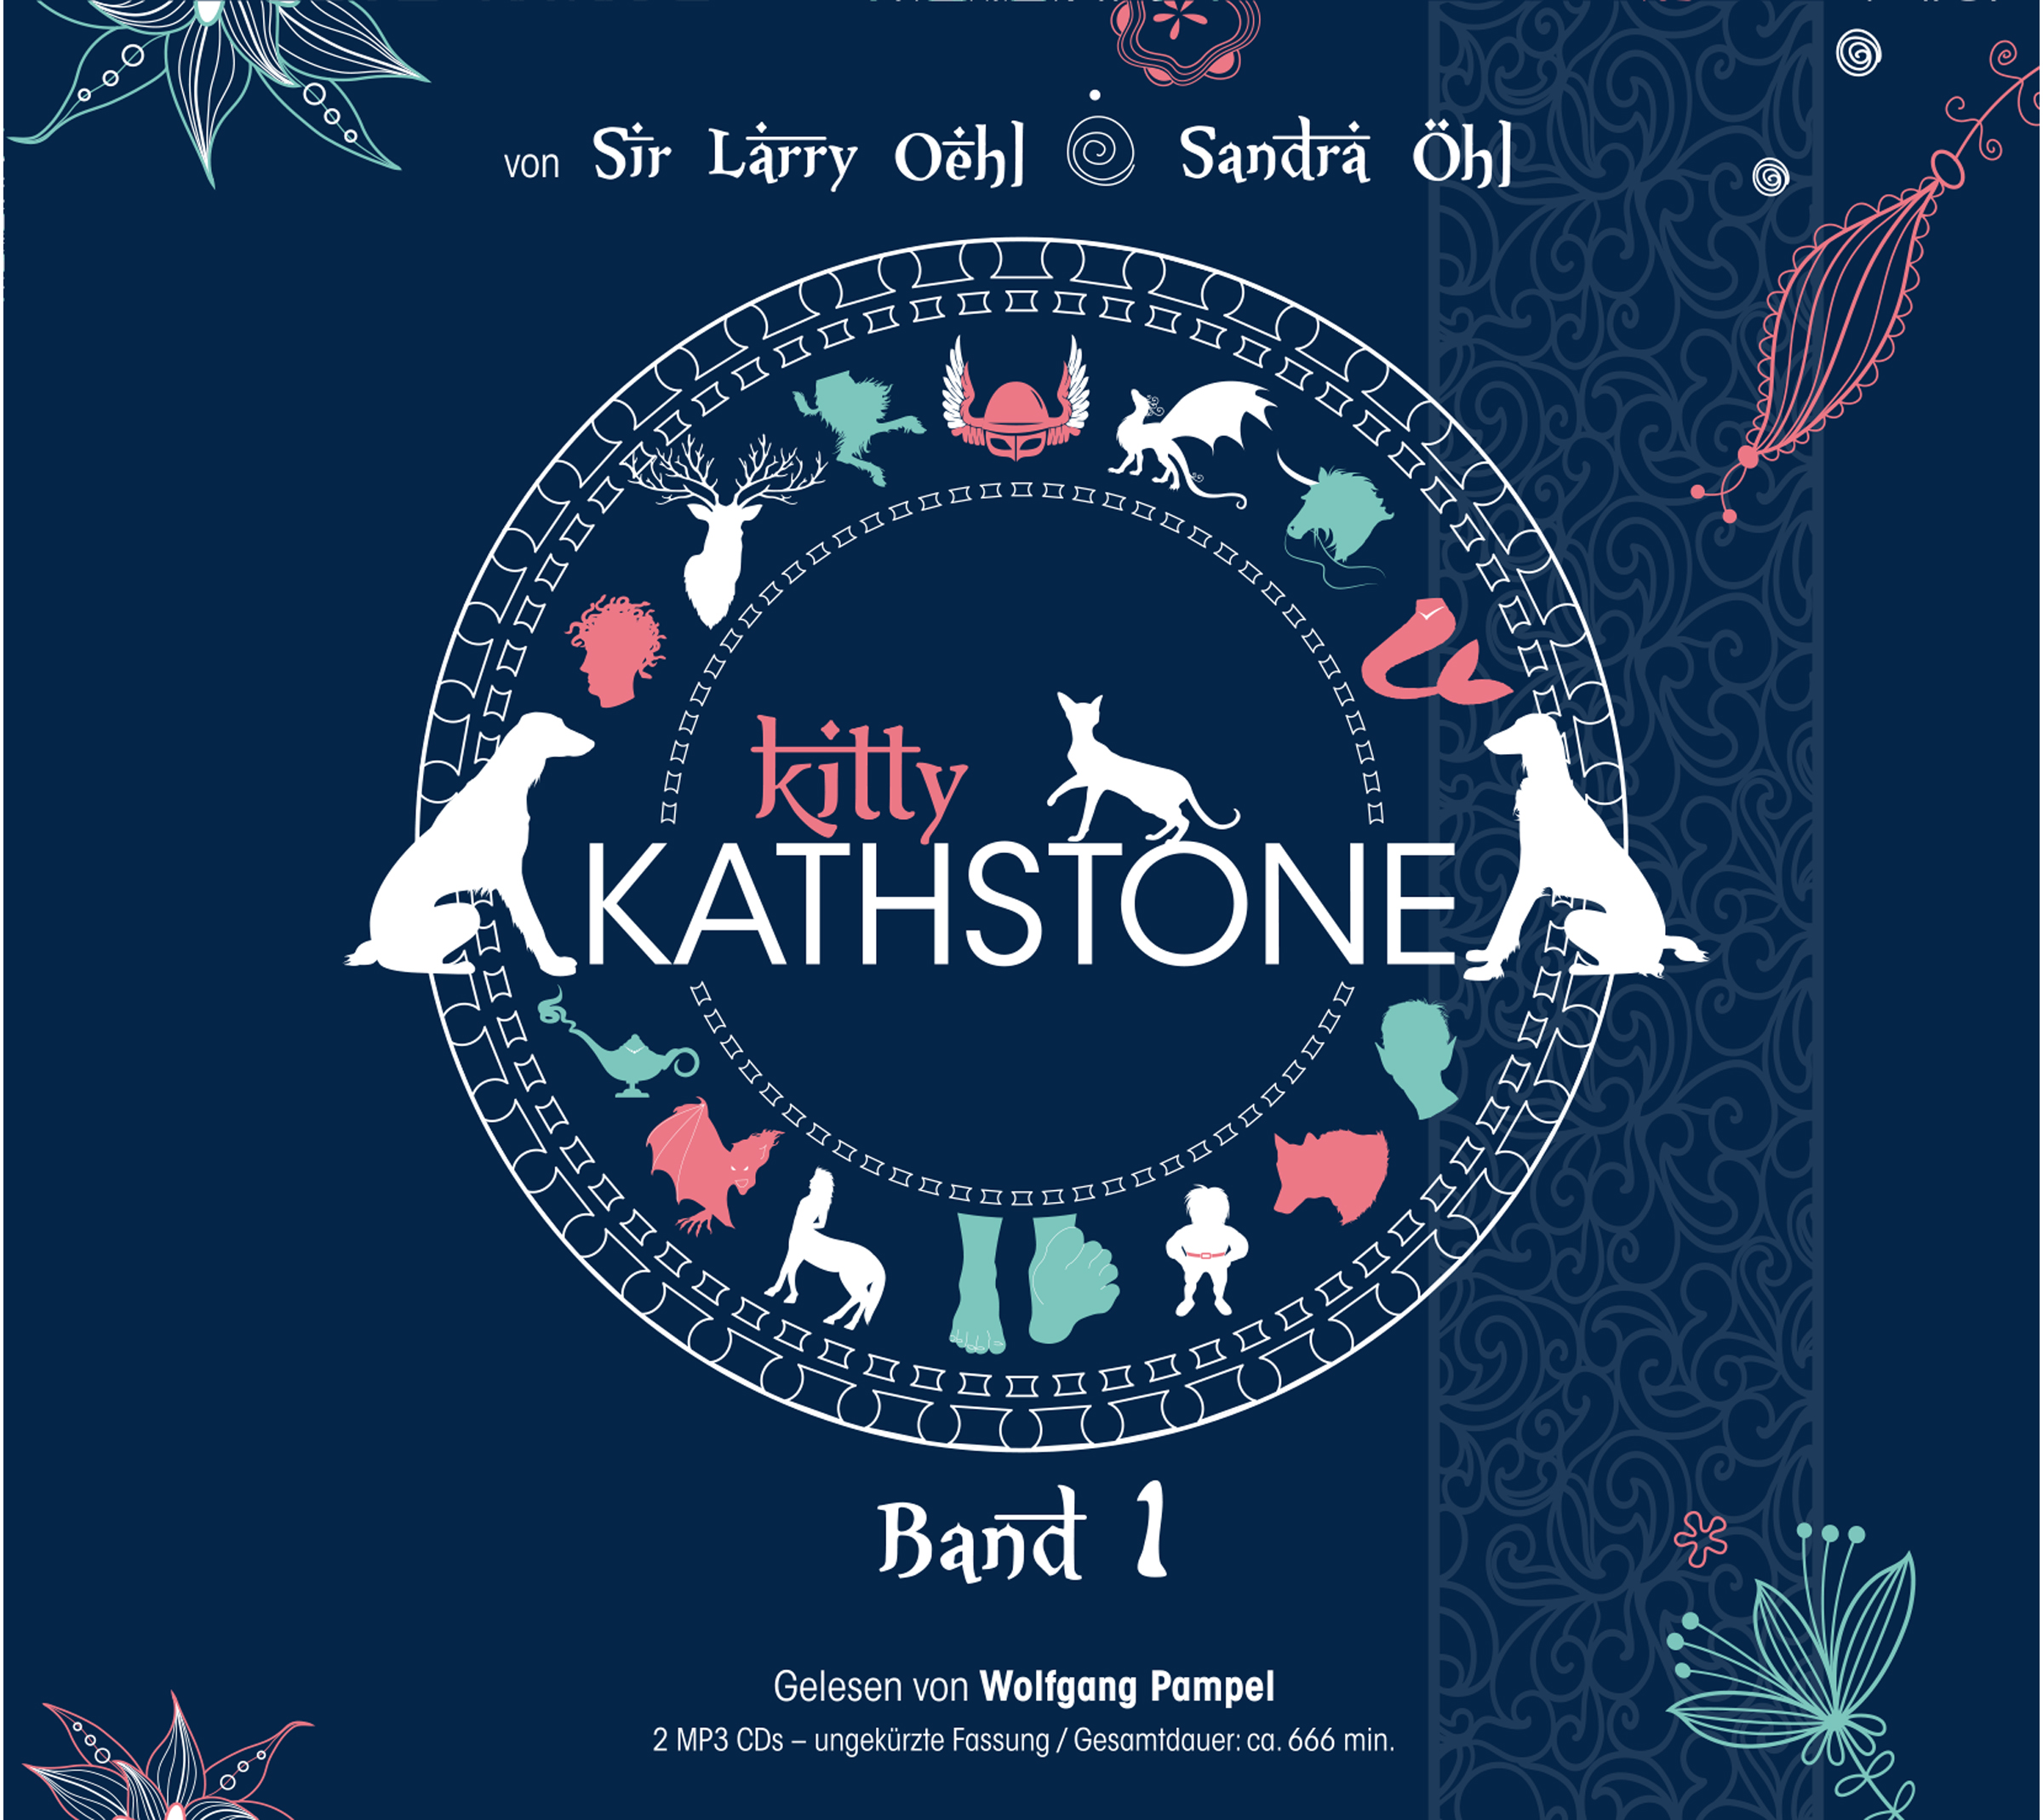 Cover für das Kitty Kathstone (Band 1) Hörbuch